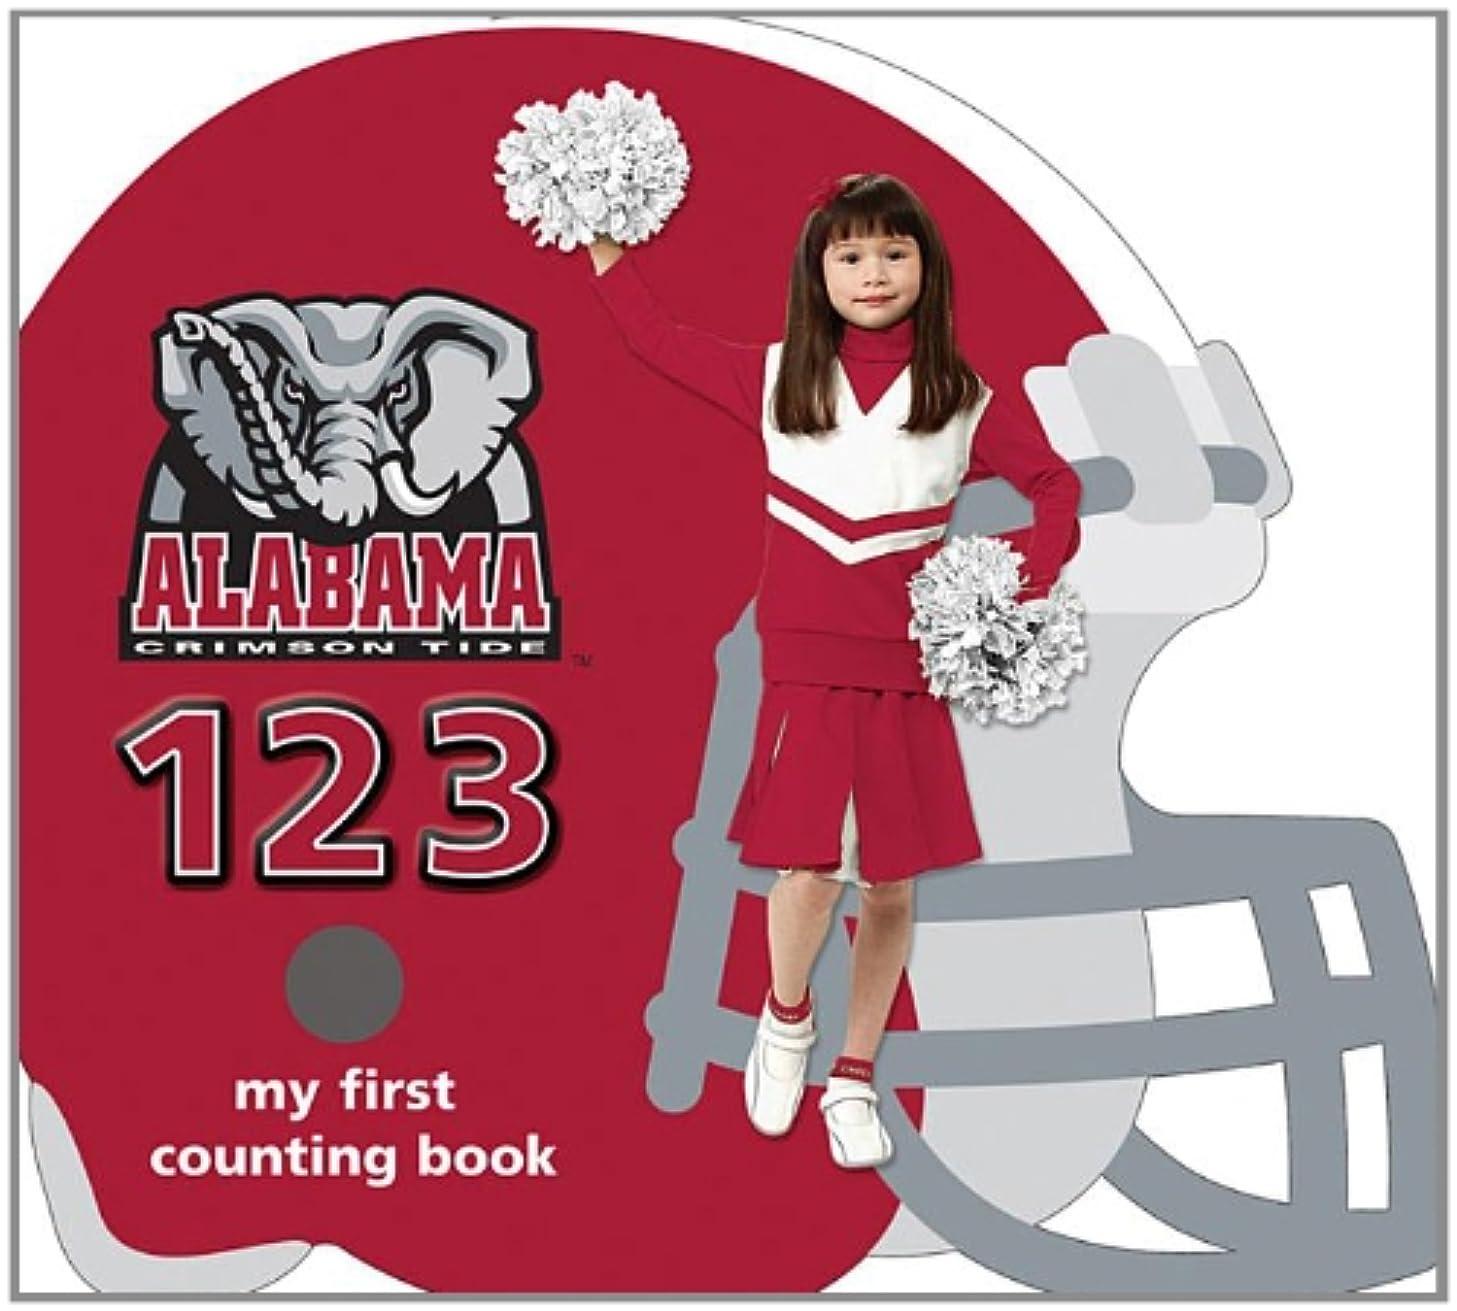 University of Alabama Crimson Tide 123: My First Counting Book (University 123 Counting Books)